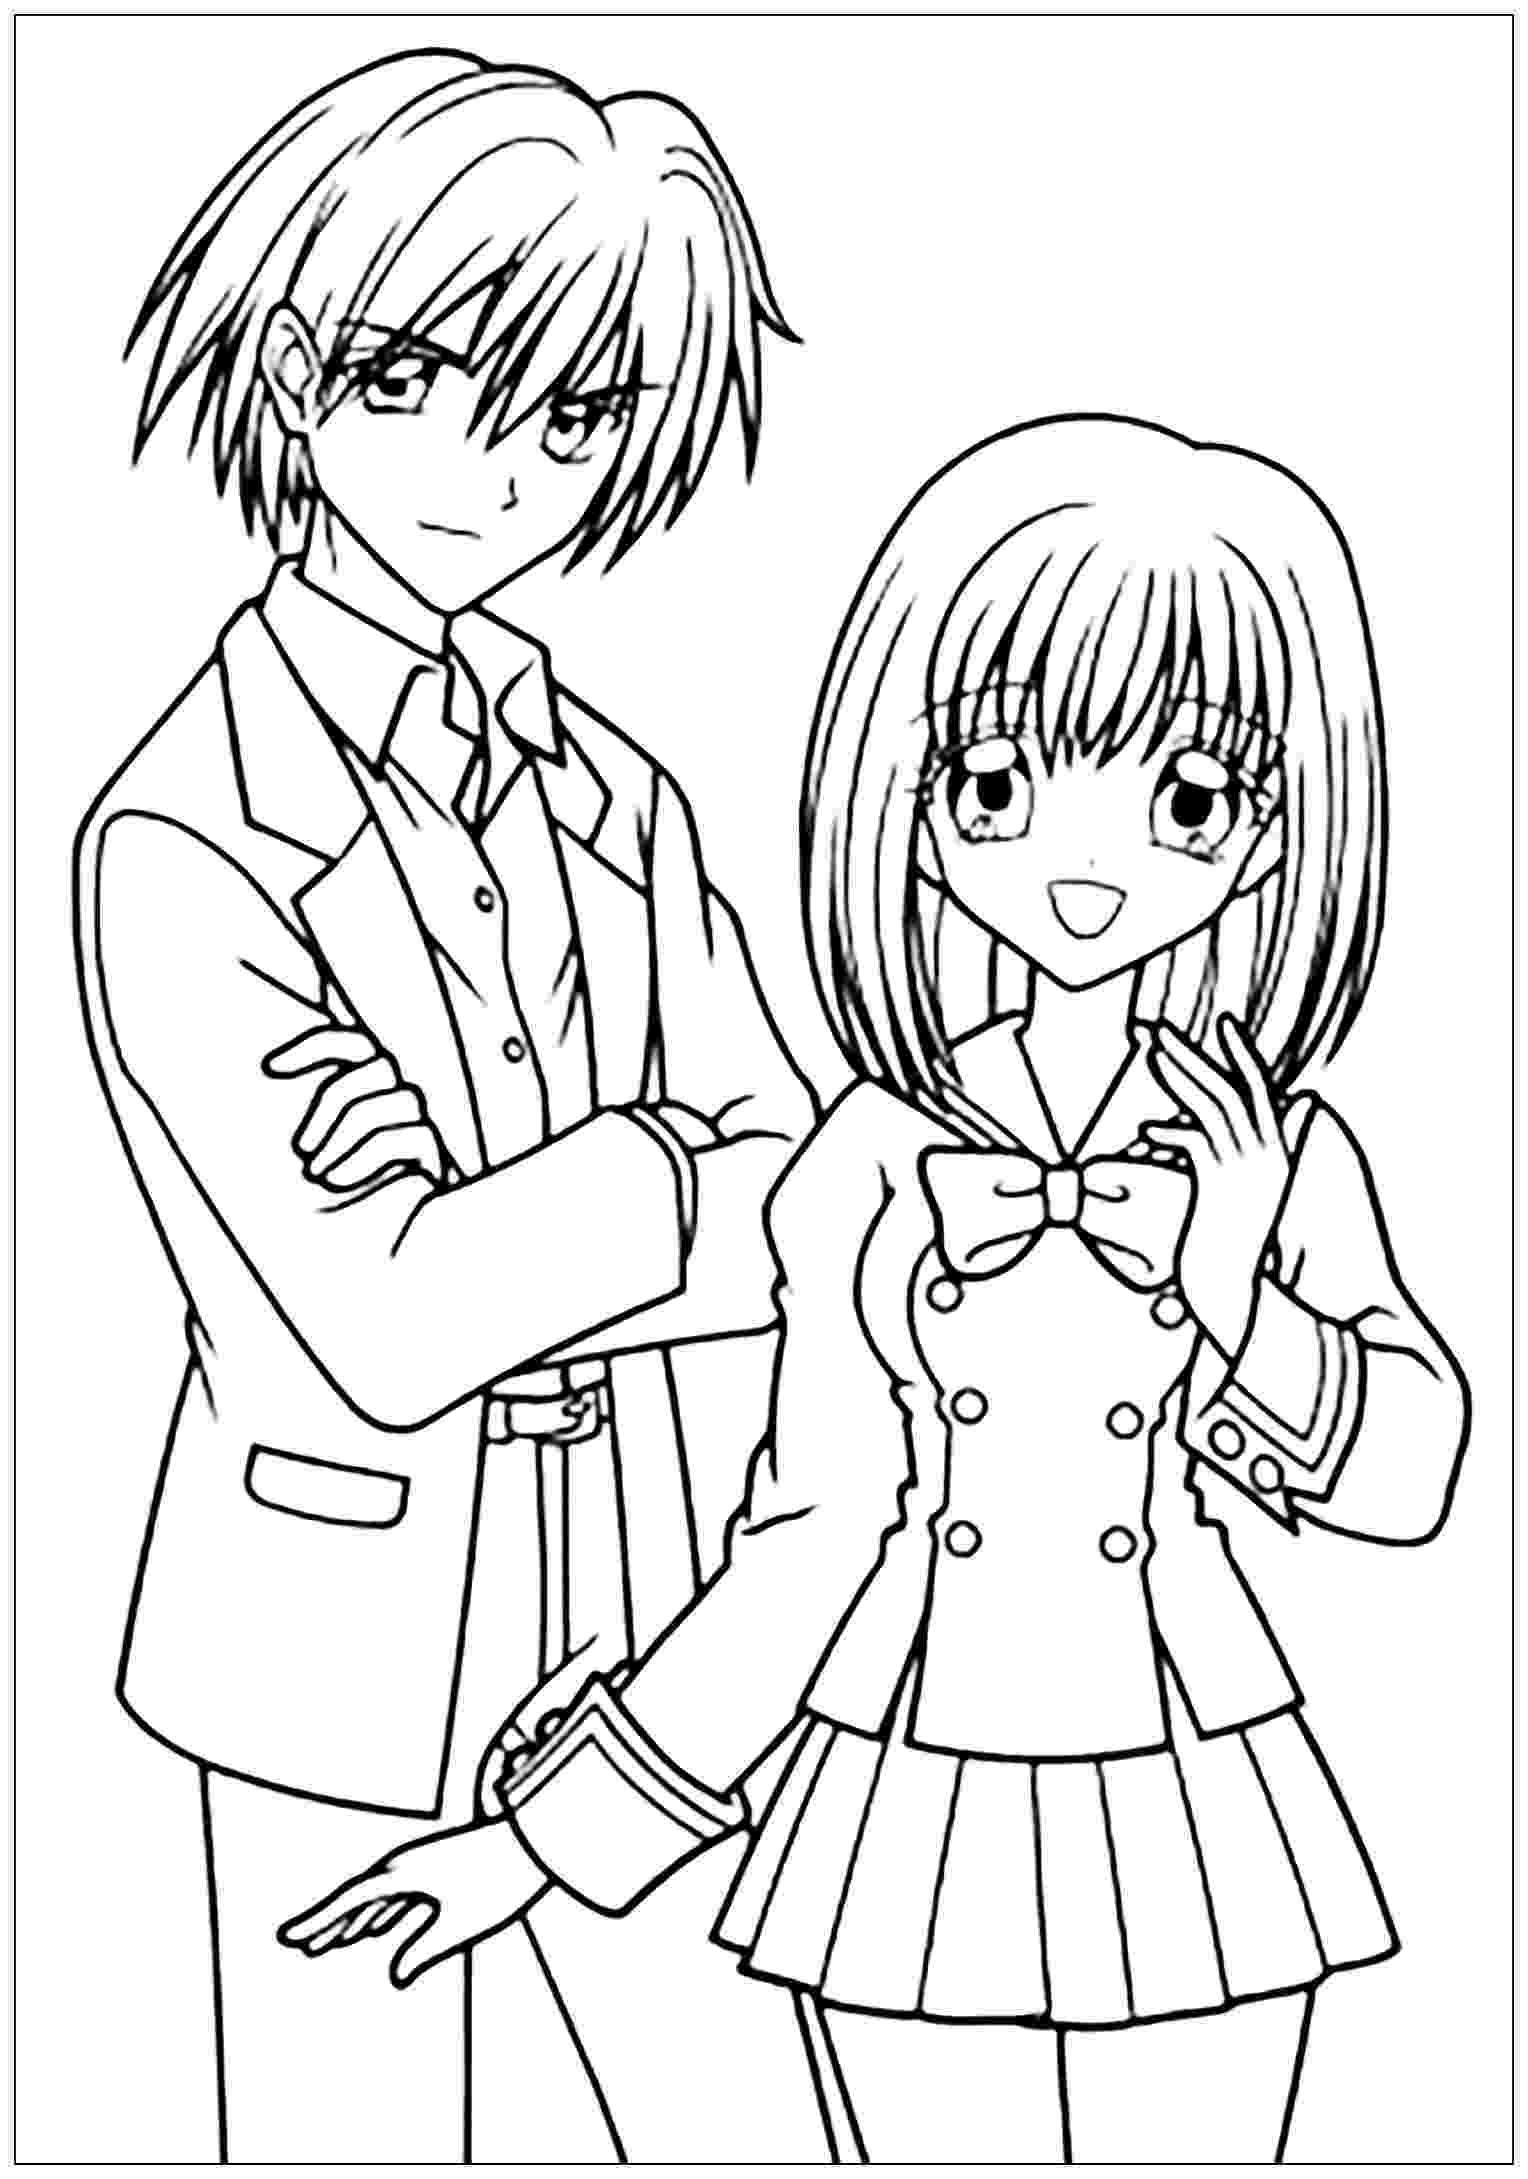 coloring pages manga shugo chara catman anime coloring pages for kids pages manga coloring